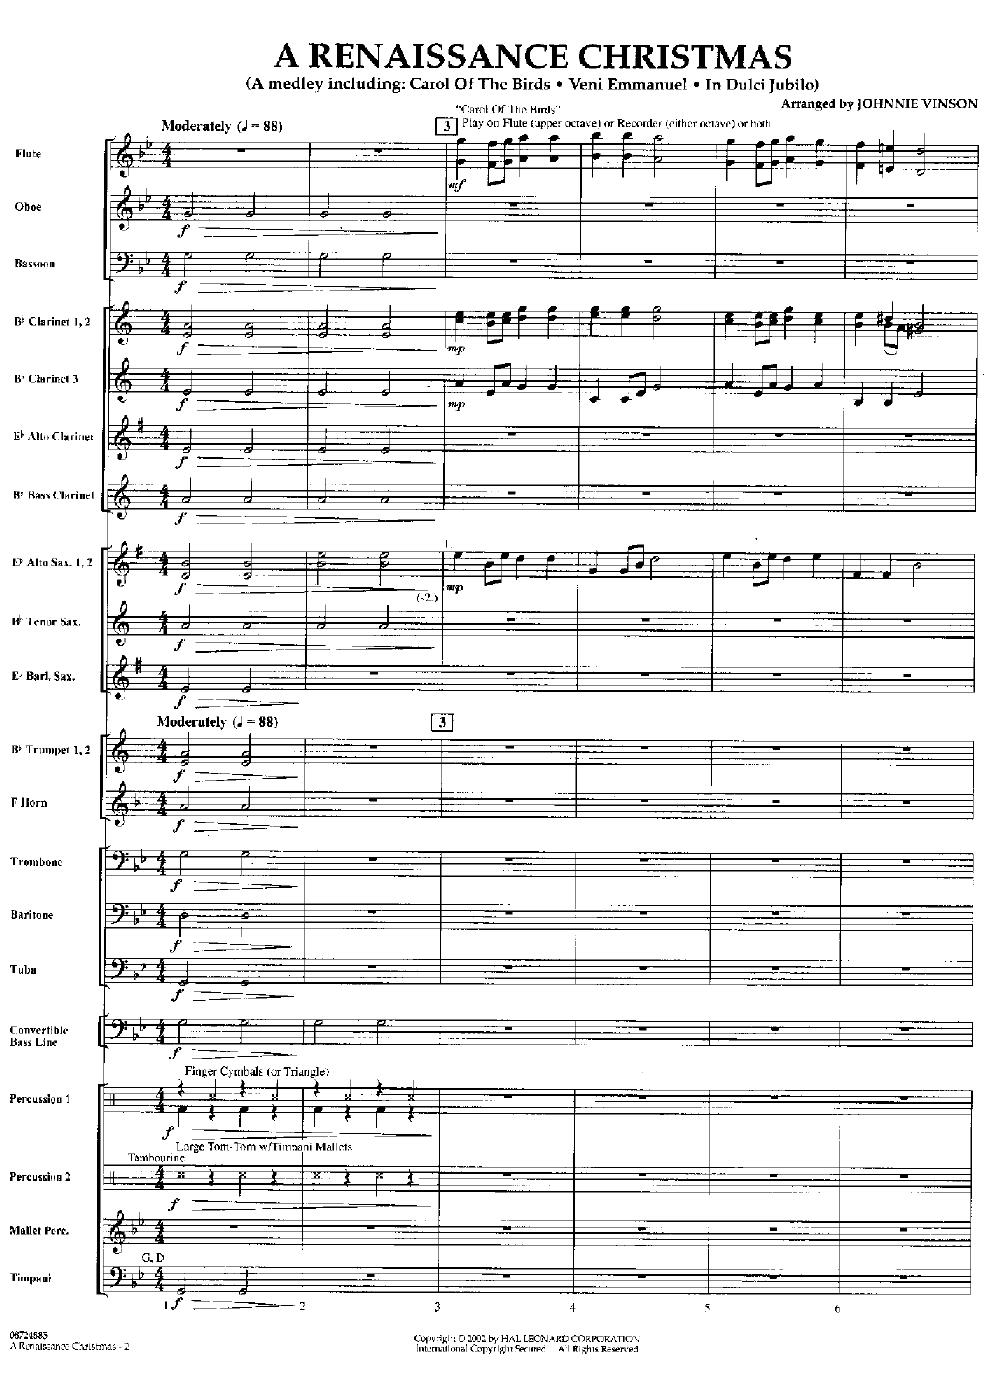 A Renaissance Christmas arr. Johnnie Vinson| J.W. Pepper Sheet Music